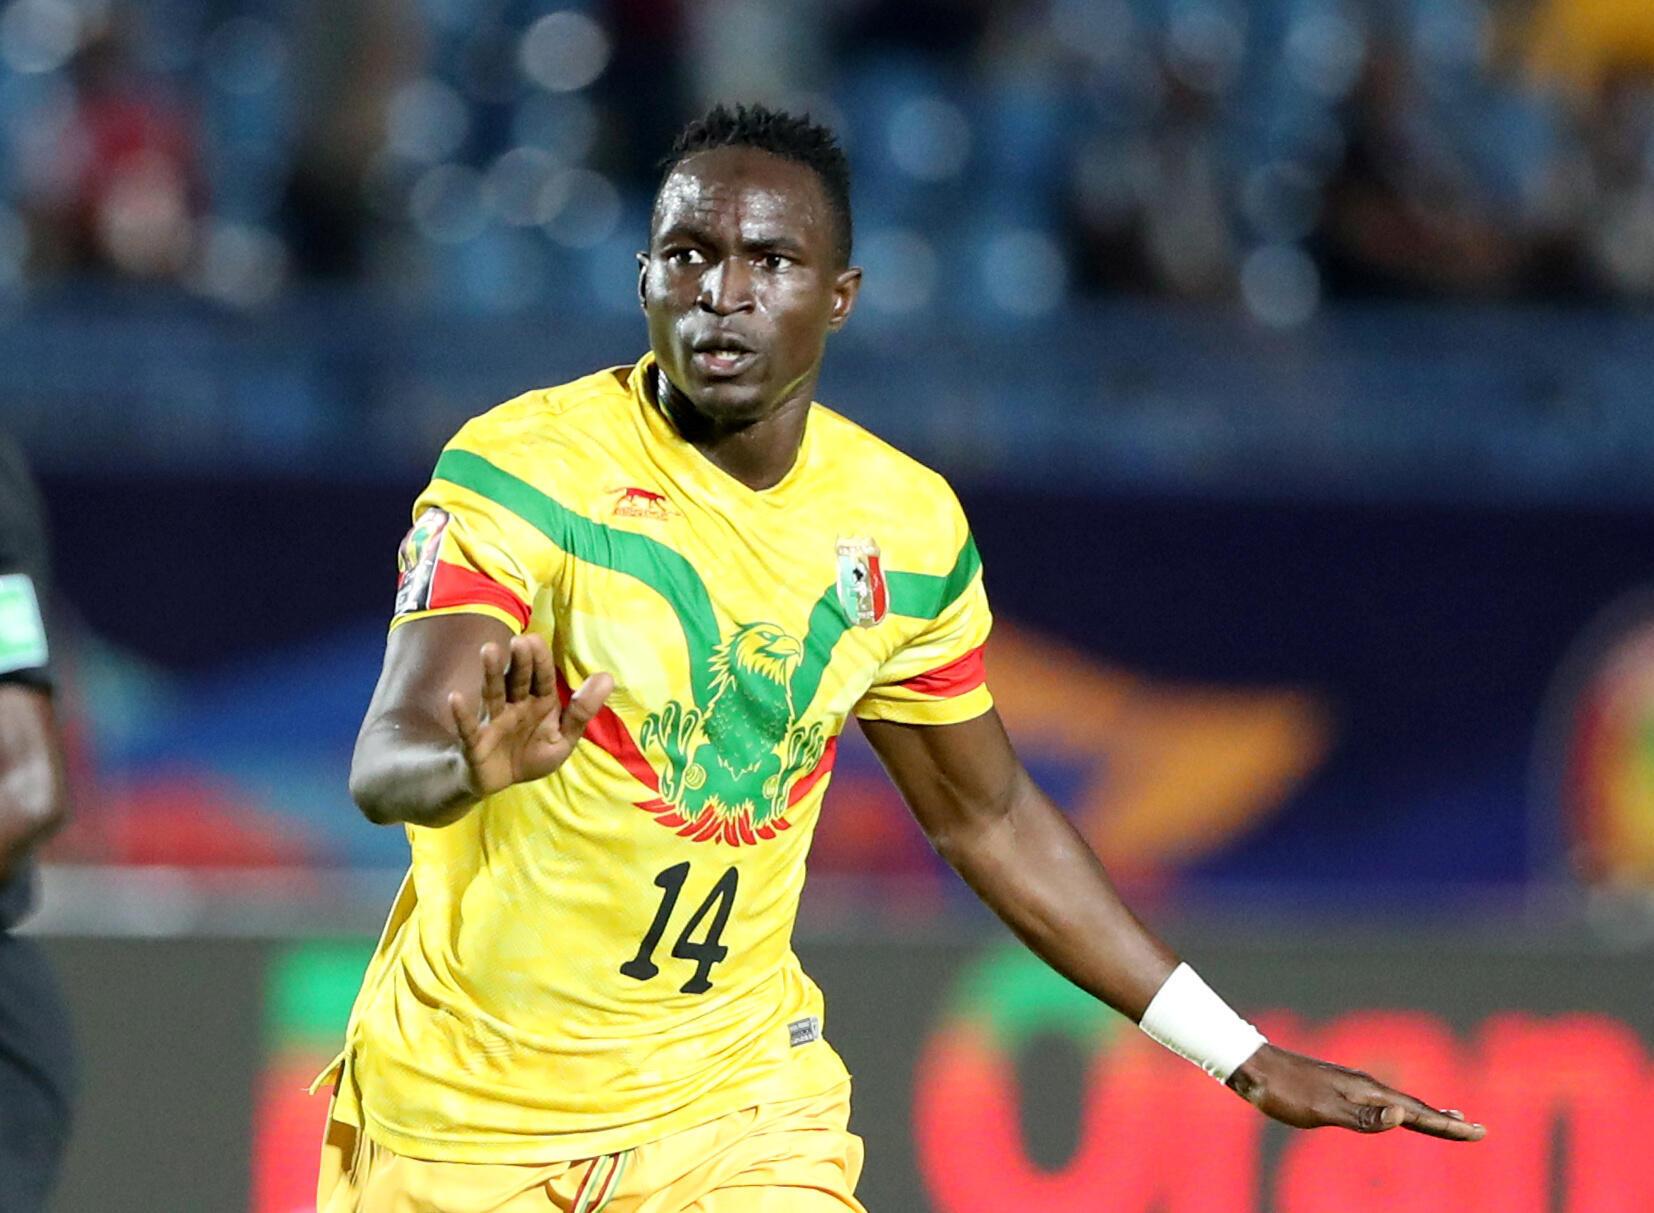 Adama Traoré scored Mali's final goal in the 4-1 rout of Mauritania